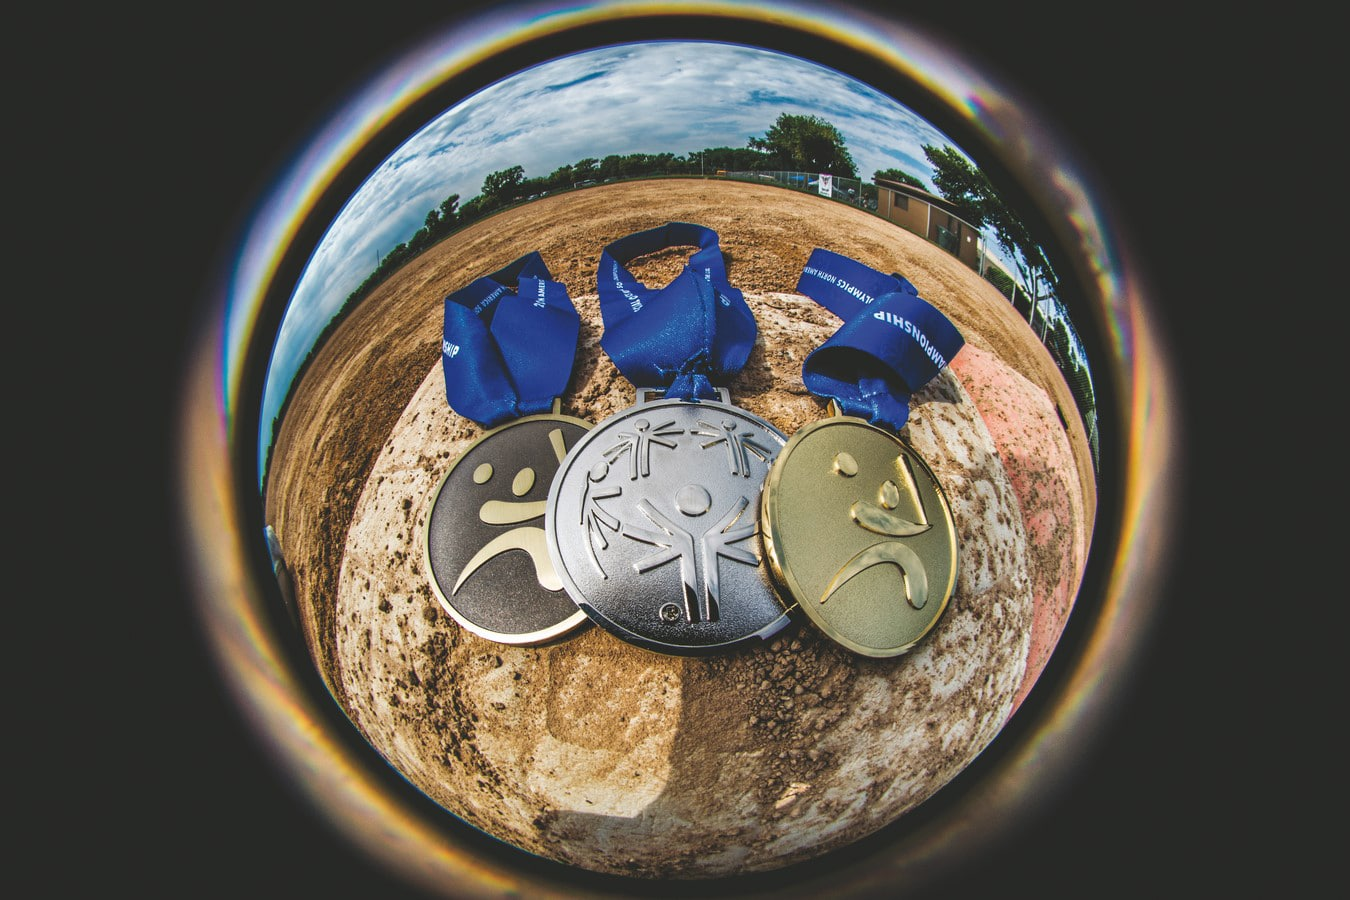 Three softball medals laying on a softball base